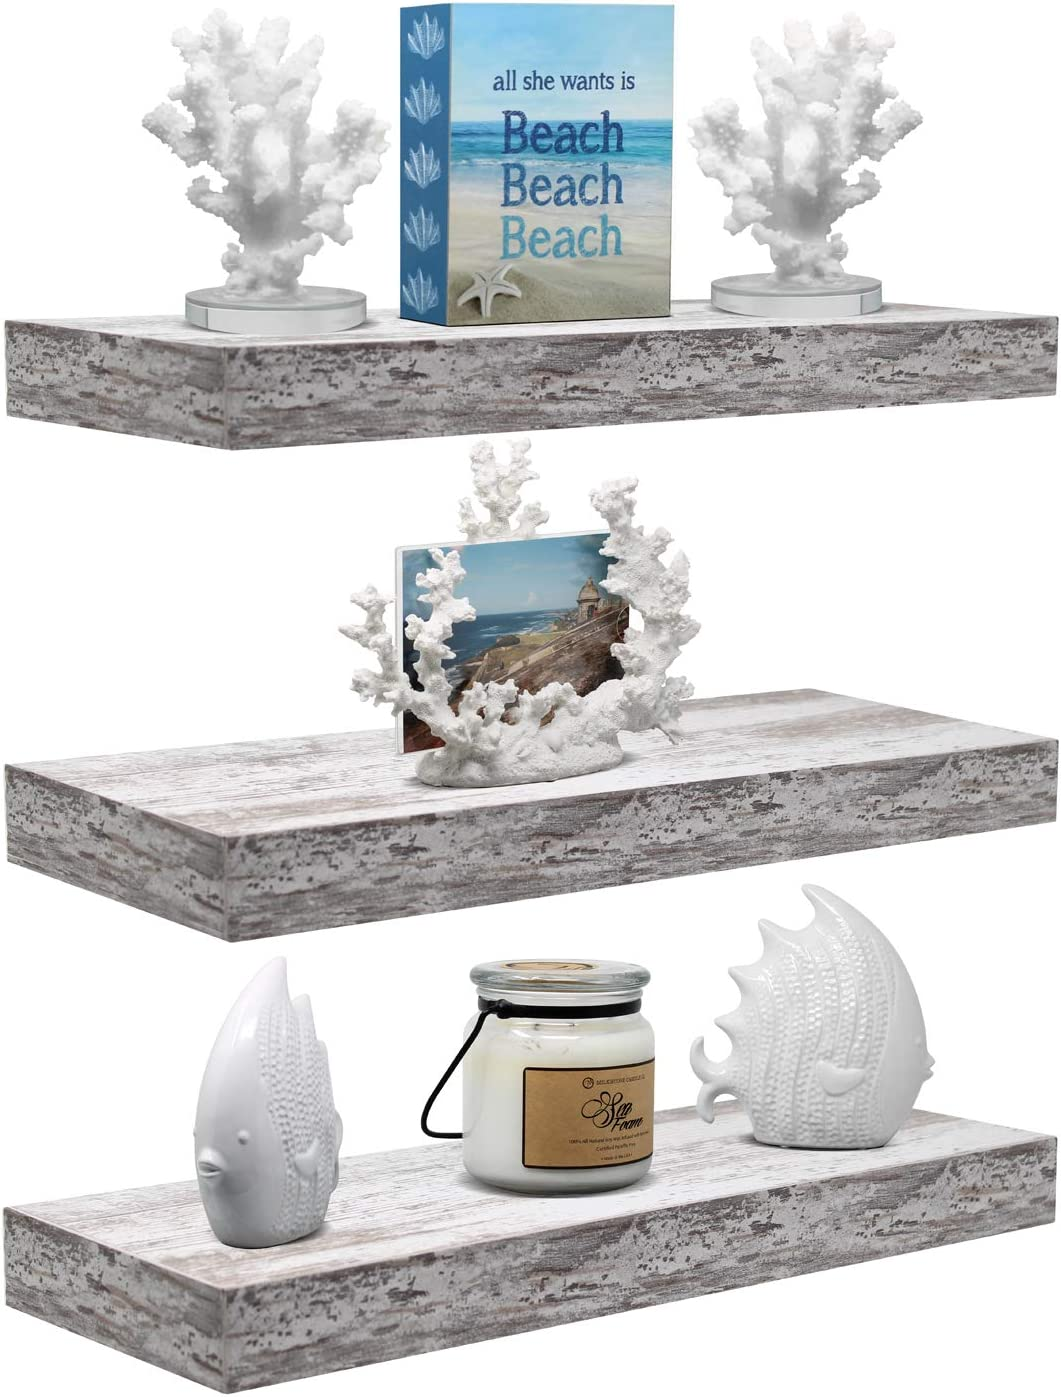 Sorbus Floating Shelf Set — Rustic Wood Coastal Beach Style Hanging Rectangle Wall Shelves for Home Décor, Trophy Display, Photo Frames, etc (3-Pack, Rectangle Shelf Set - White)